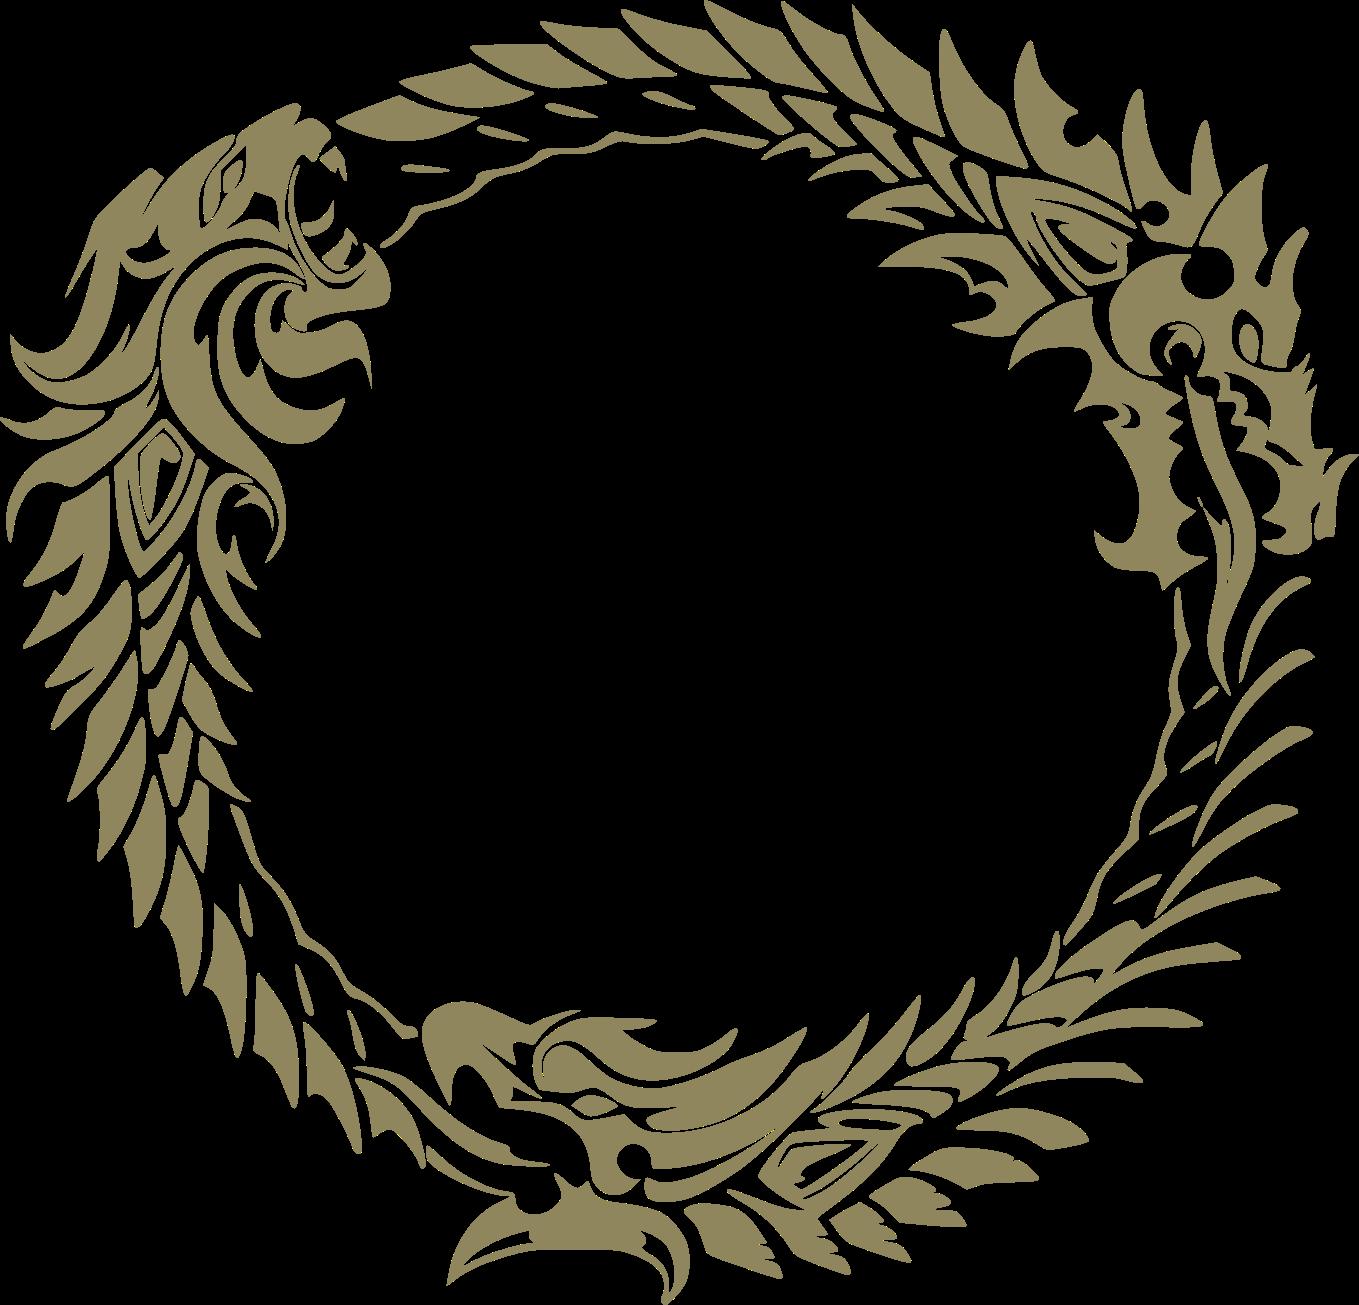 Elder Scrolls Online Subcategory?-Elder Scrolls Online Subcategory?-3